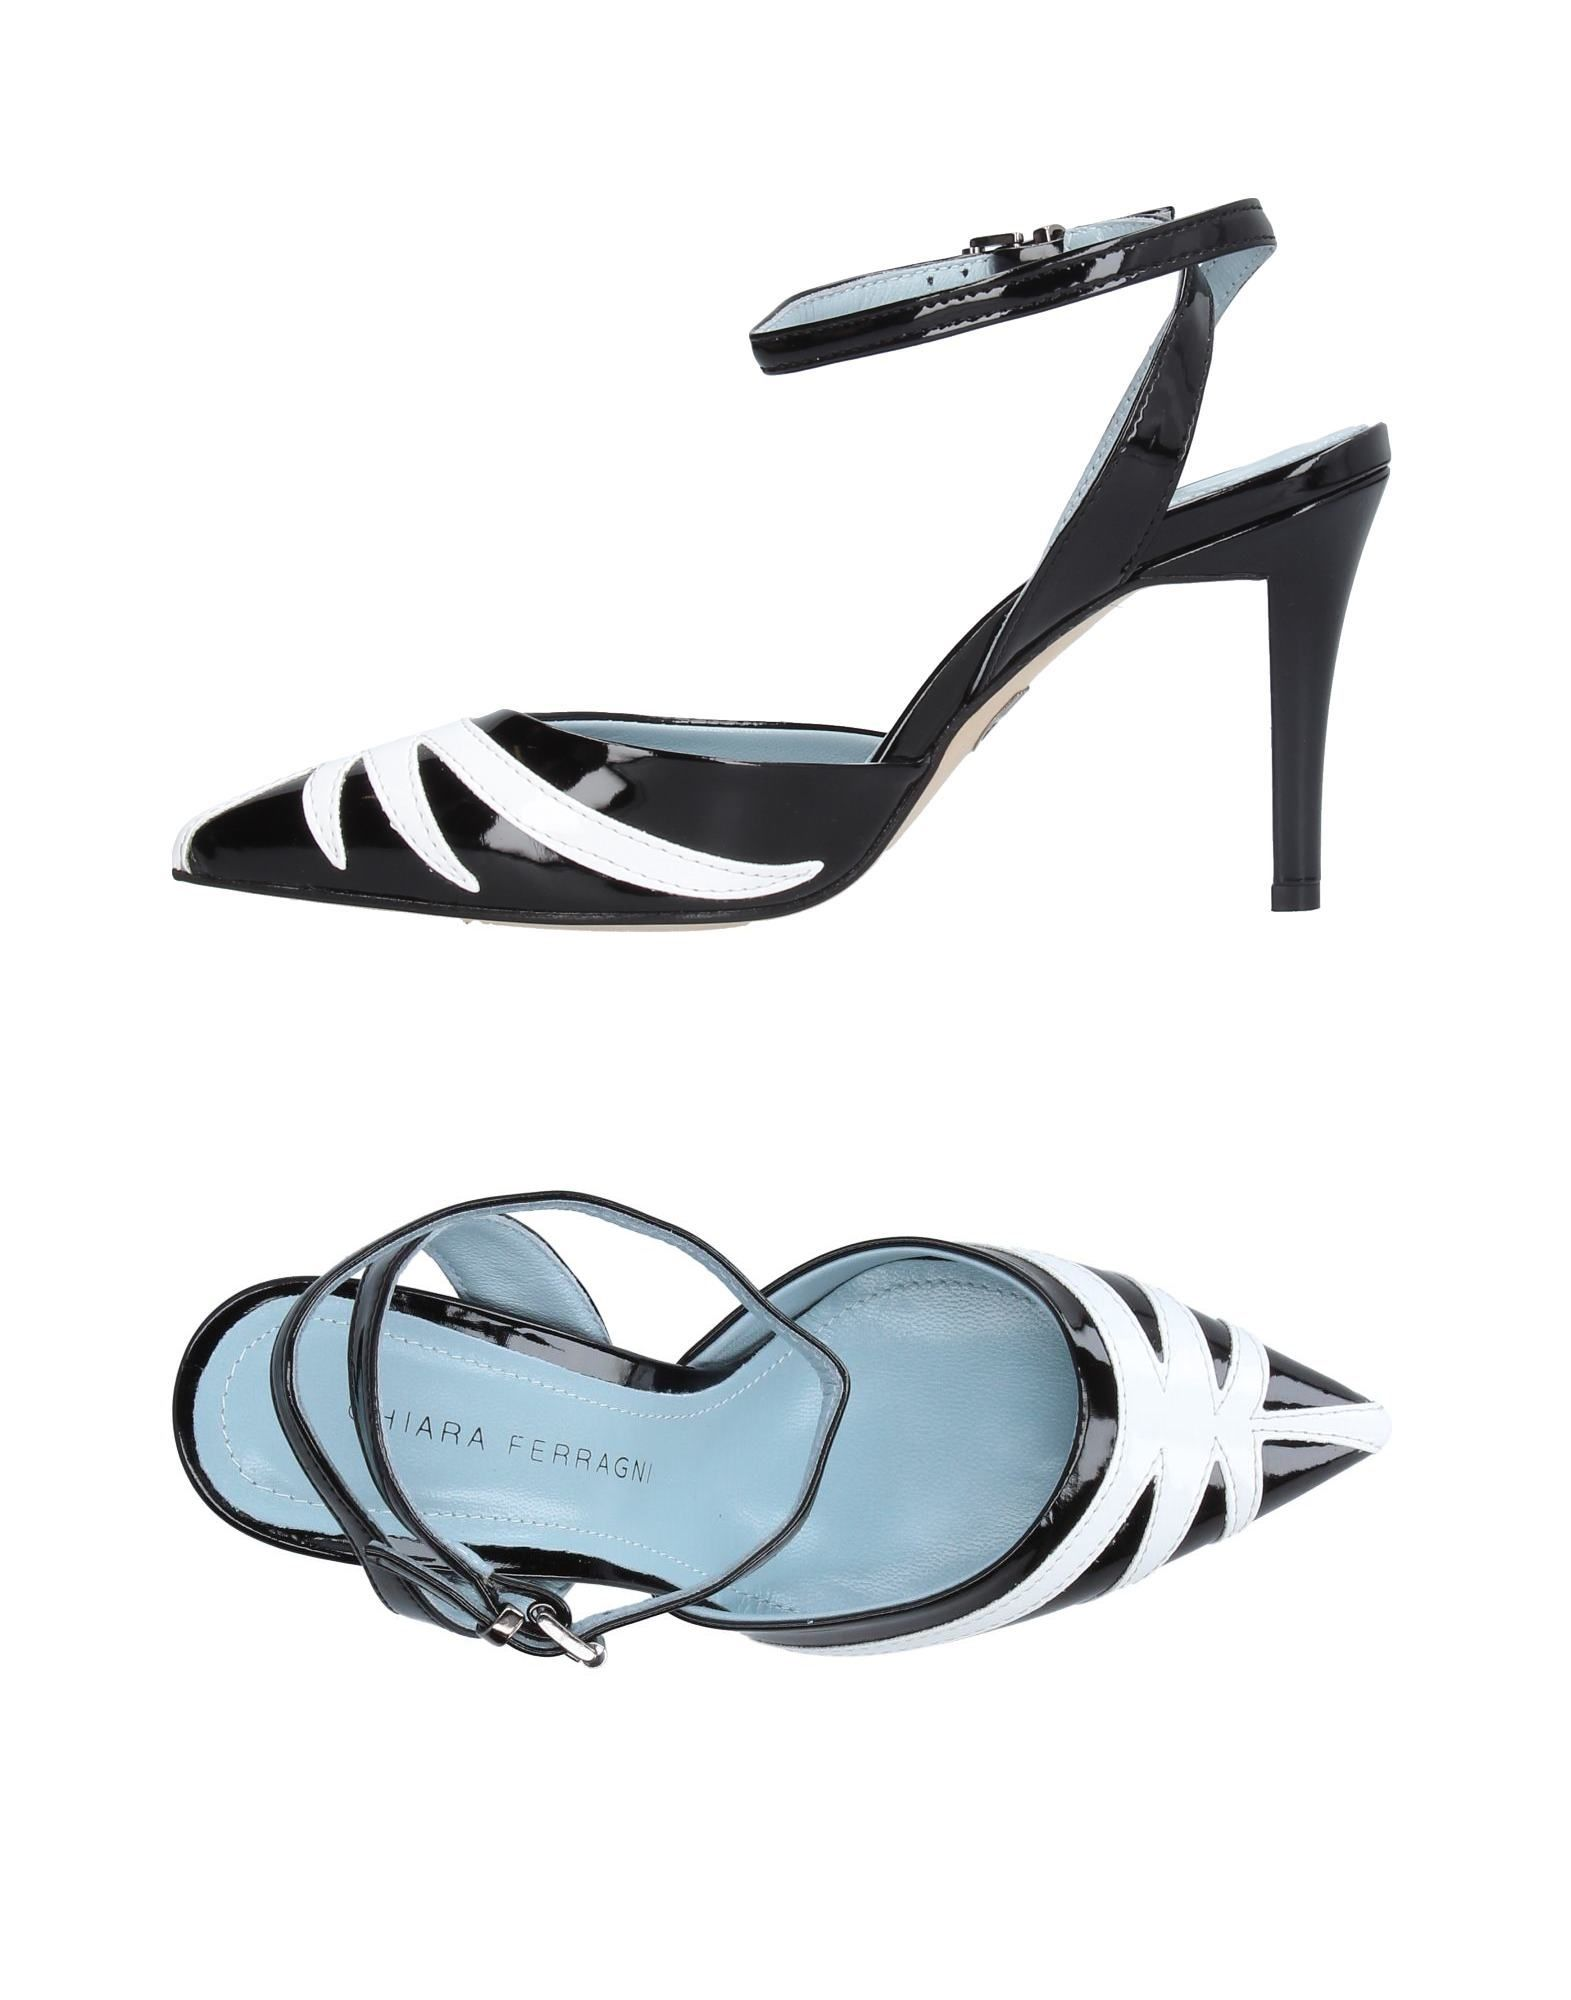 Stilvolle billige Pumps Schuhe Chiara Ferragni Pumps billige Damen  11227995XO b48de3